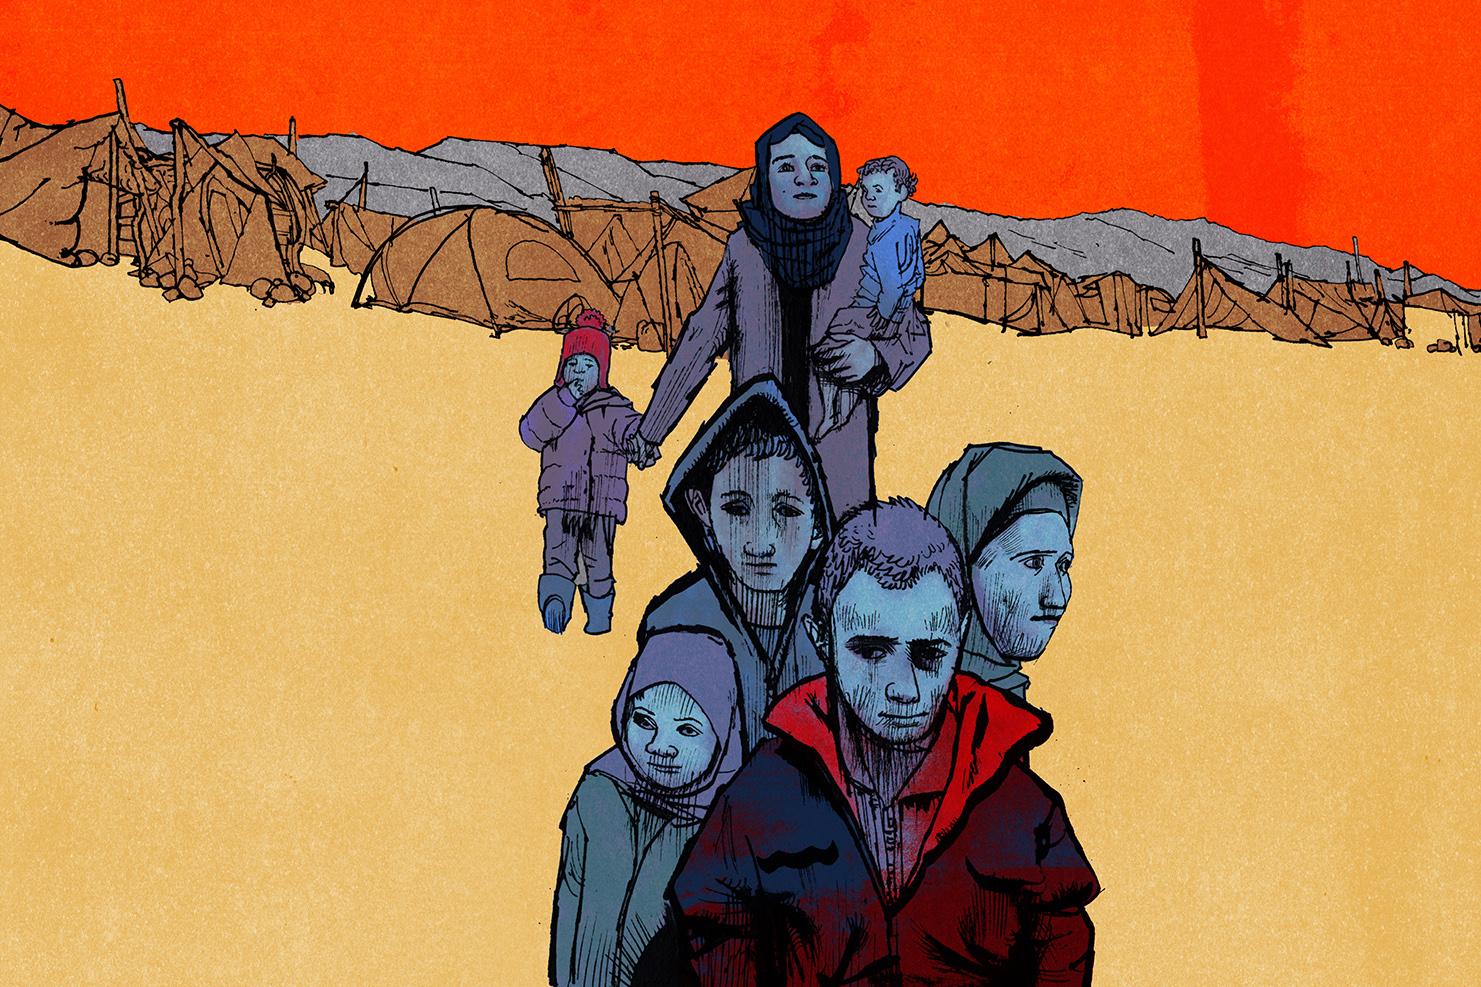 Matt Rota illustration for Foreign Policy